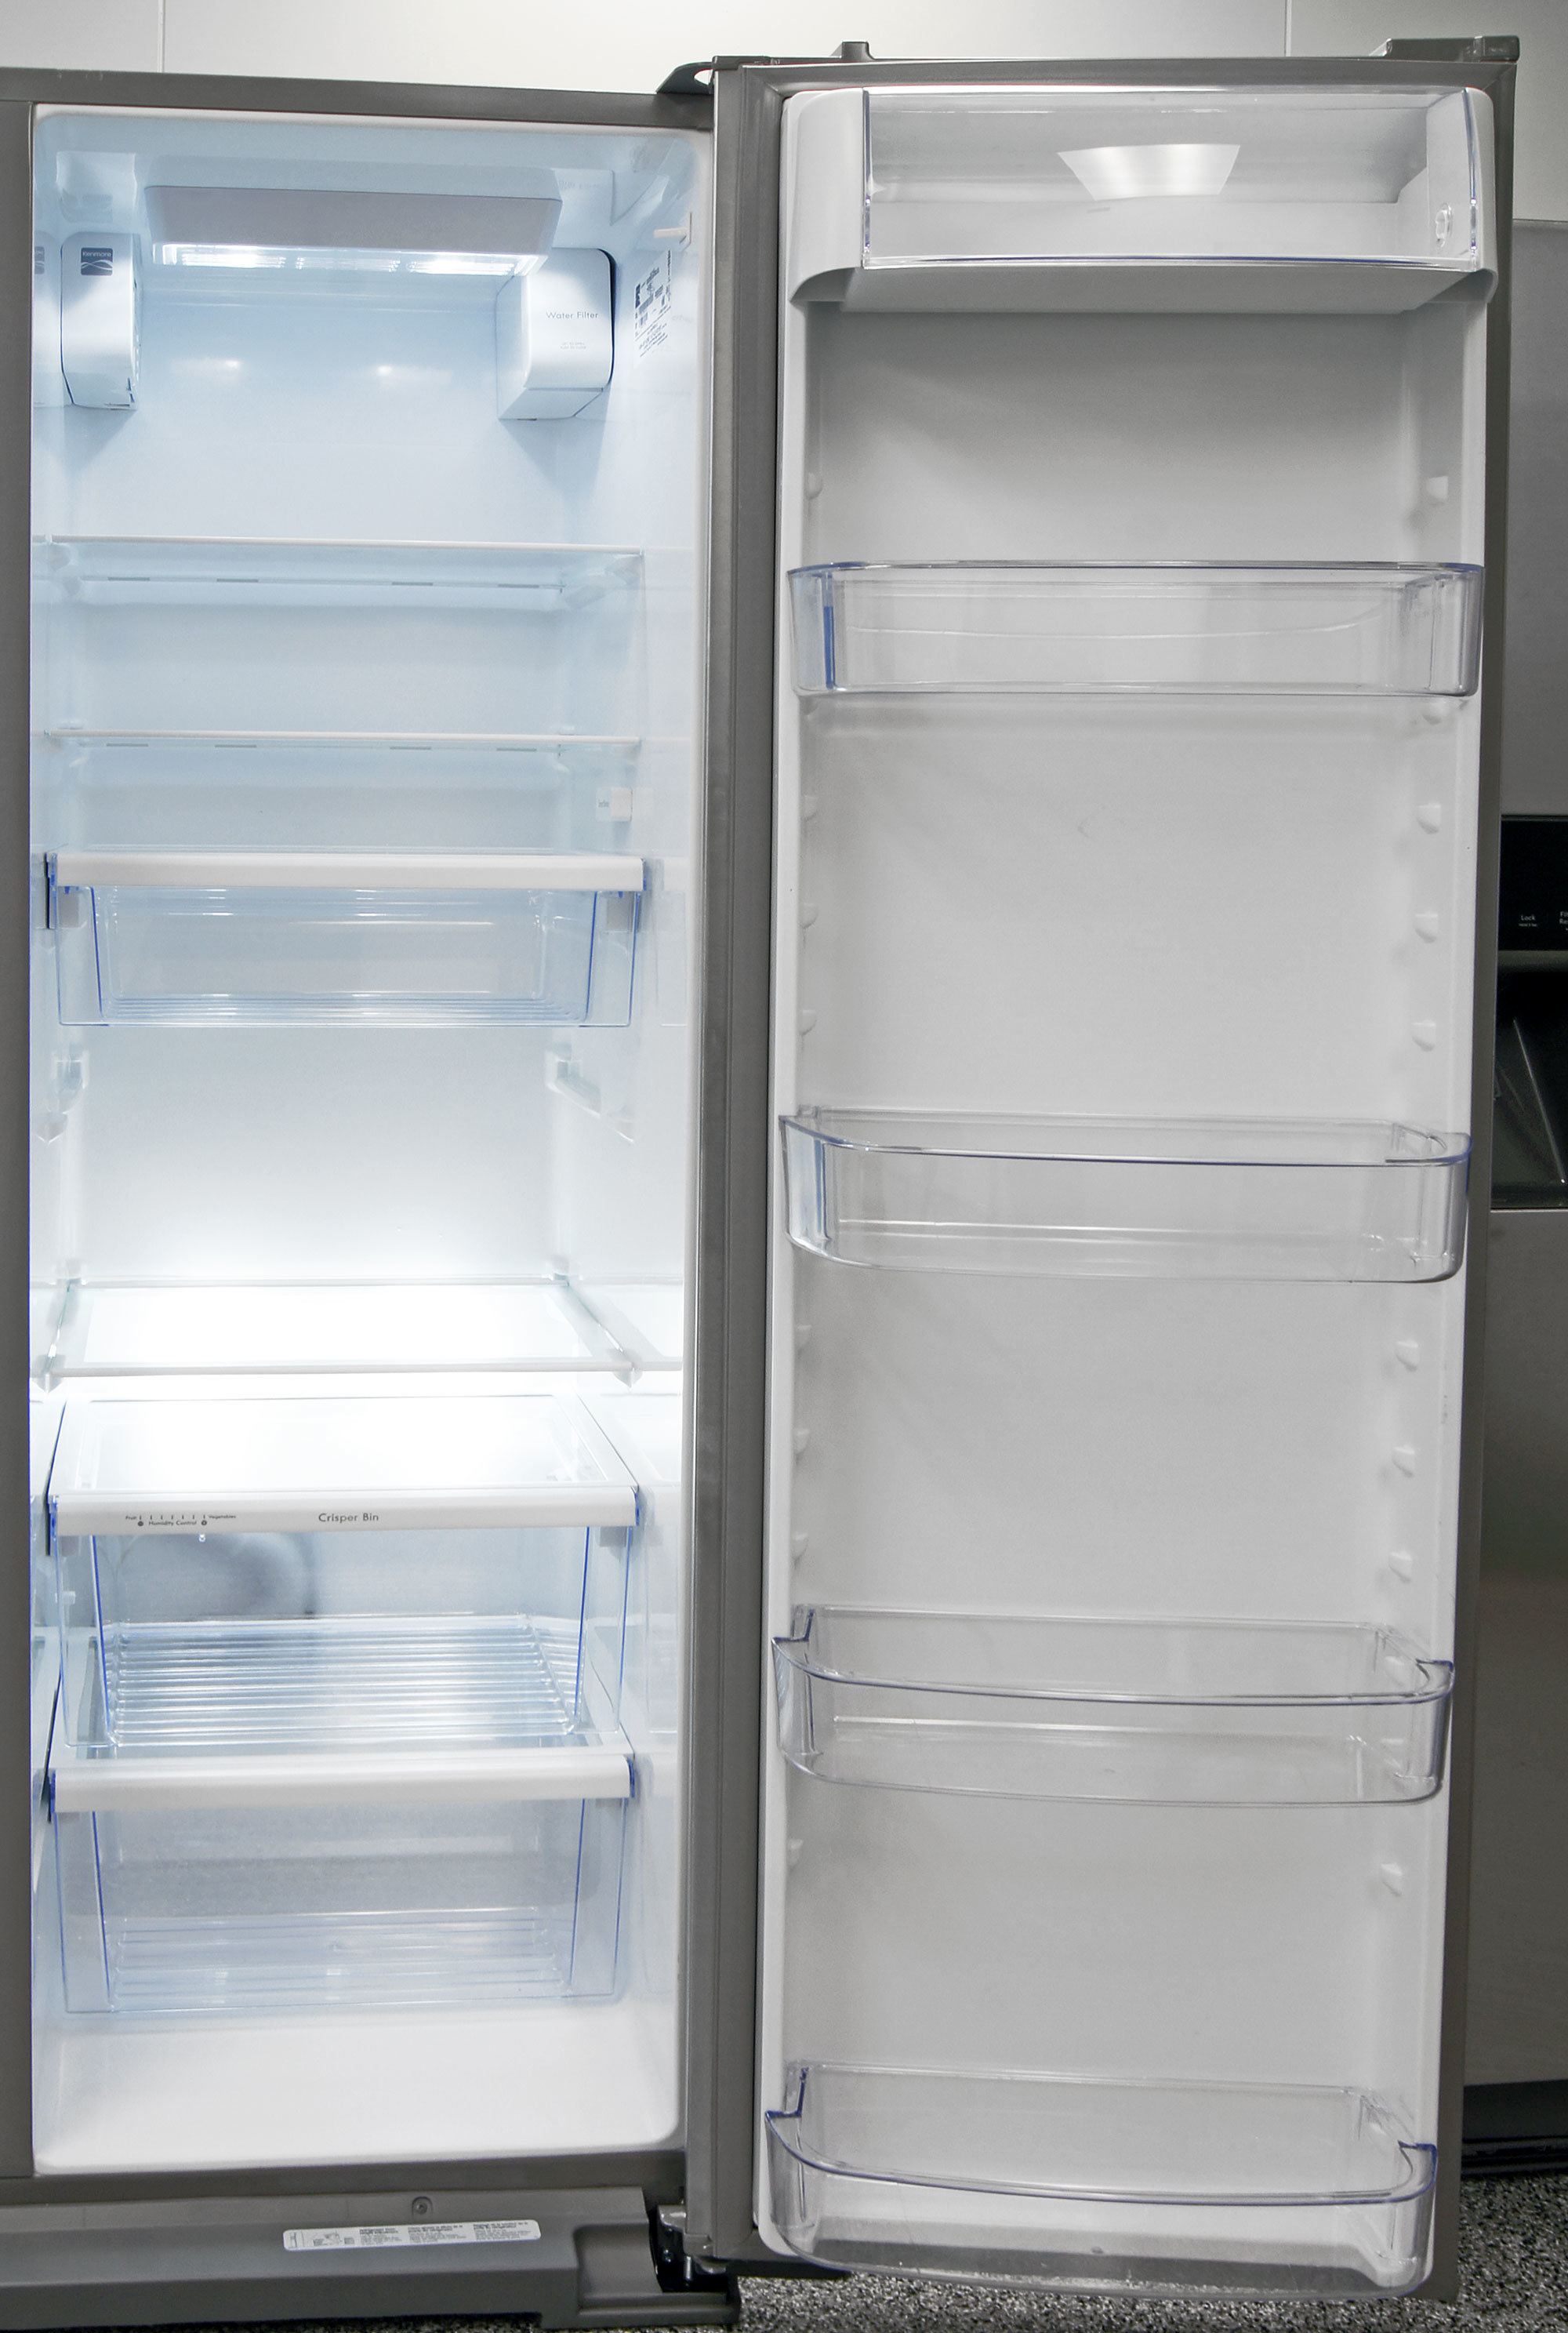 How To Level A Kenmore Refrigerator Kenmore 51783 Refrigerator Review Reviewedcom Refrigerators